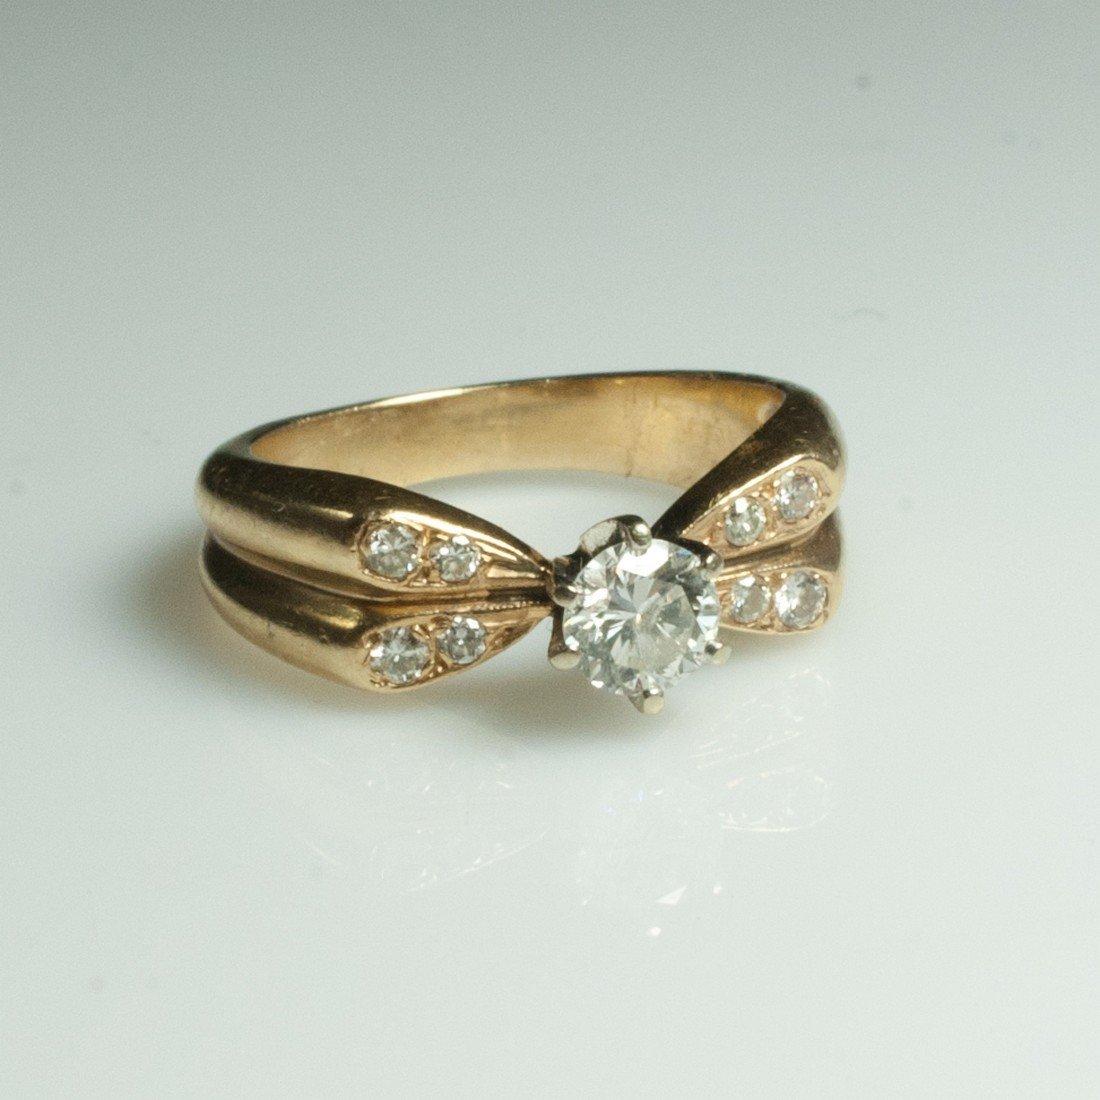 Gold & Diamond Ladies Engagement Ring